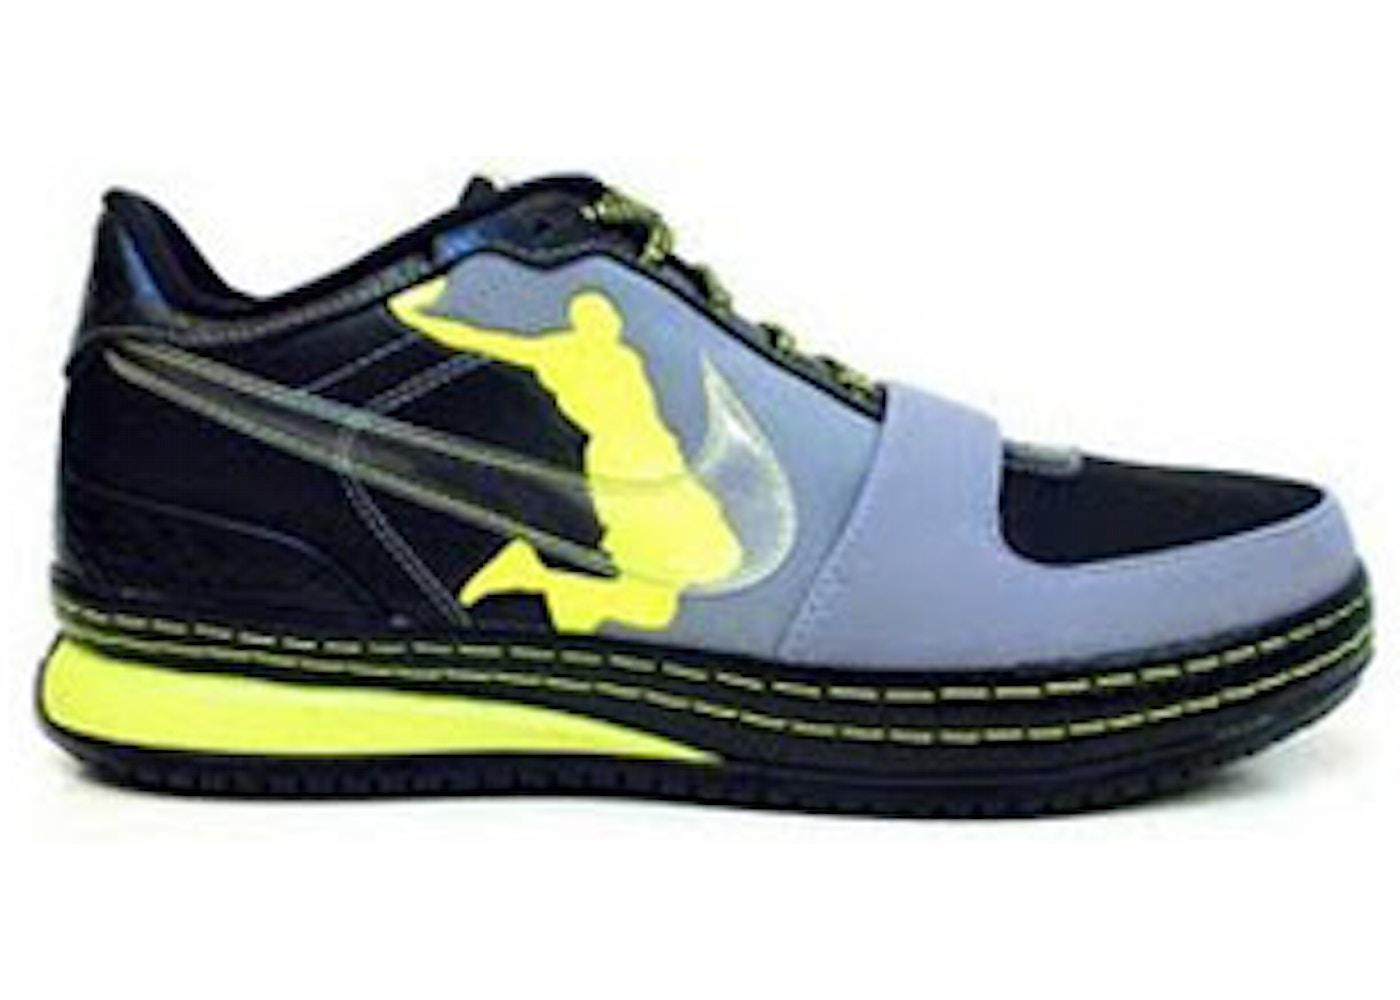 bbc8ab299f7 Nike LeBron 6 Shoes - Last Sale